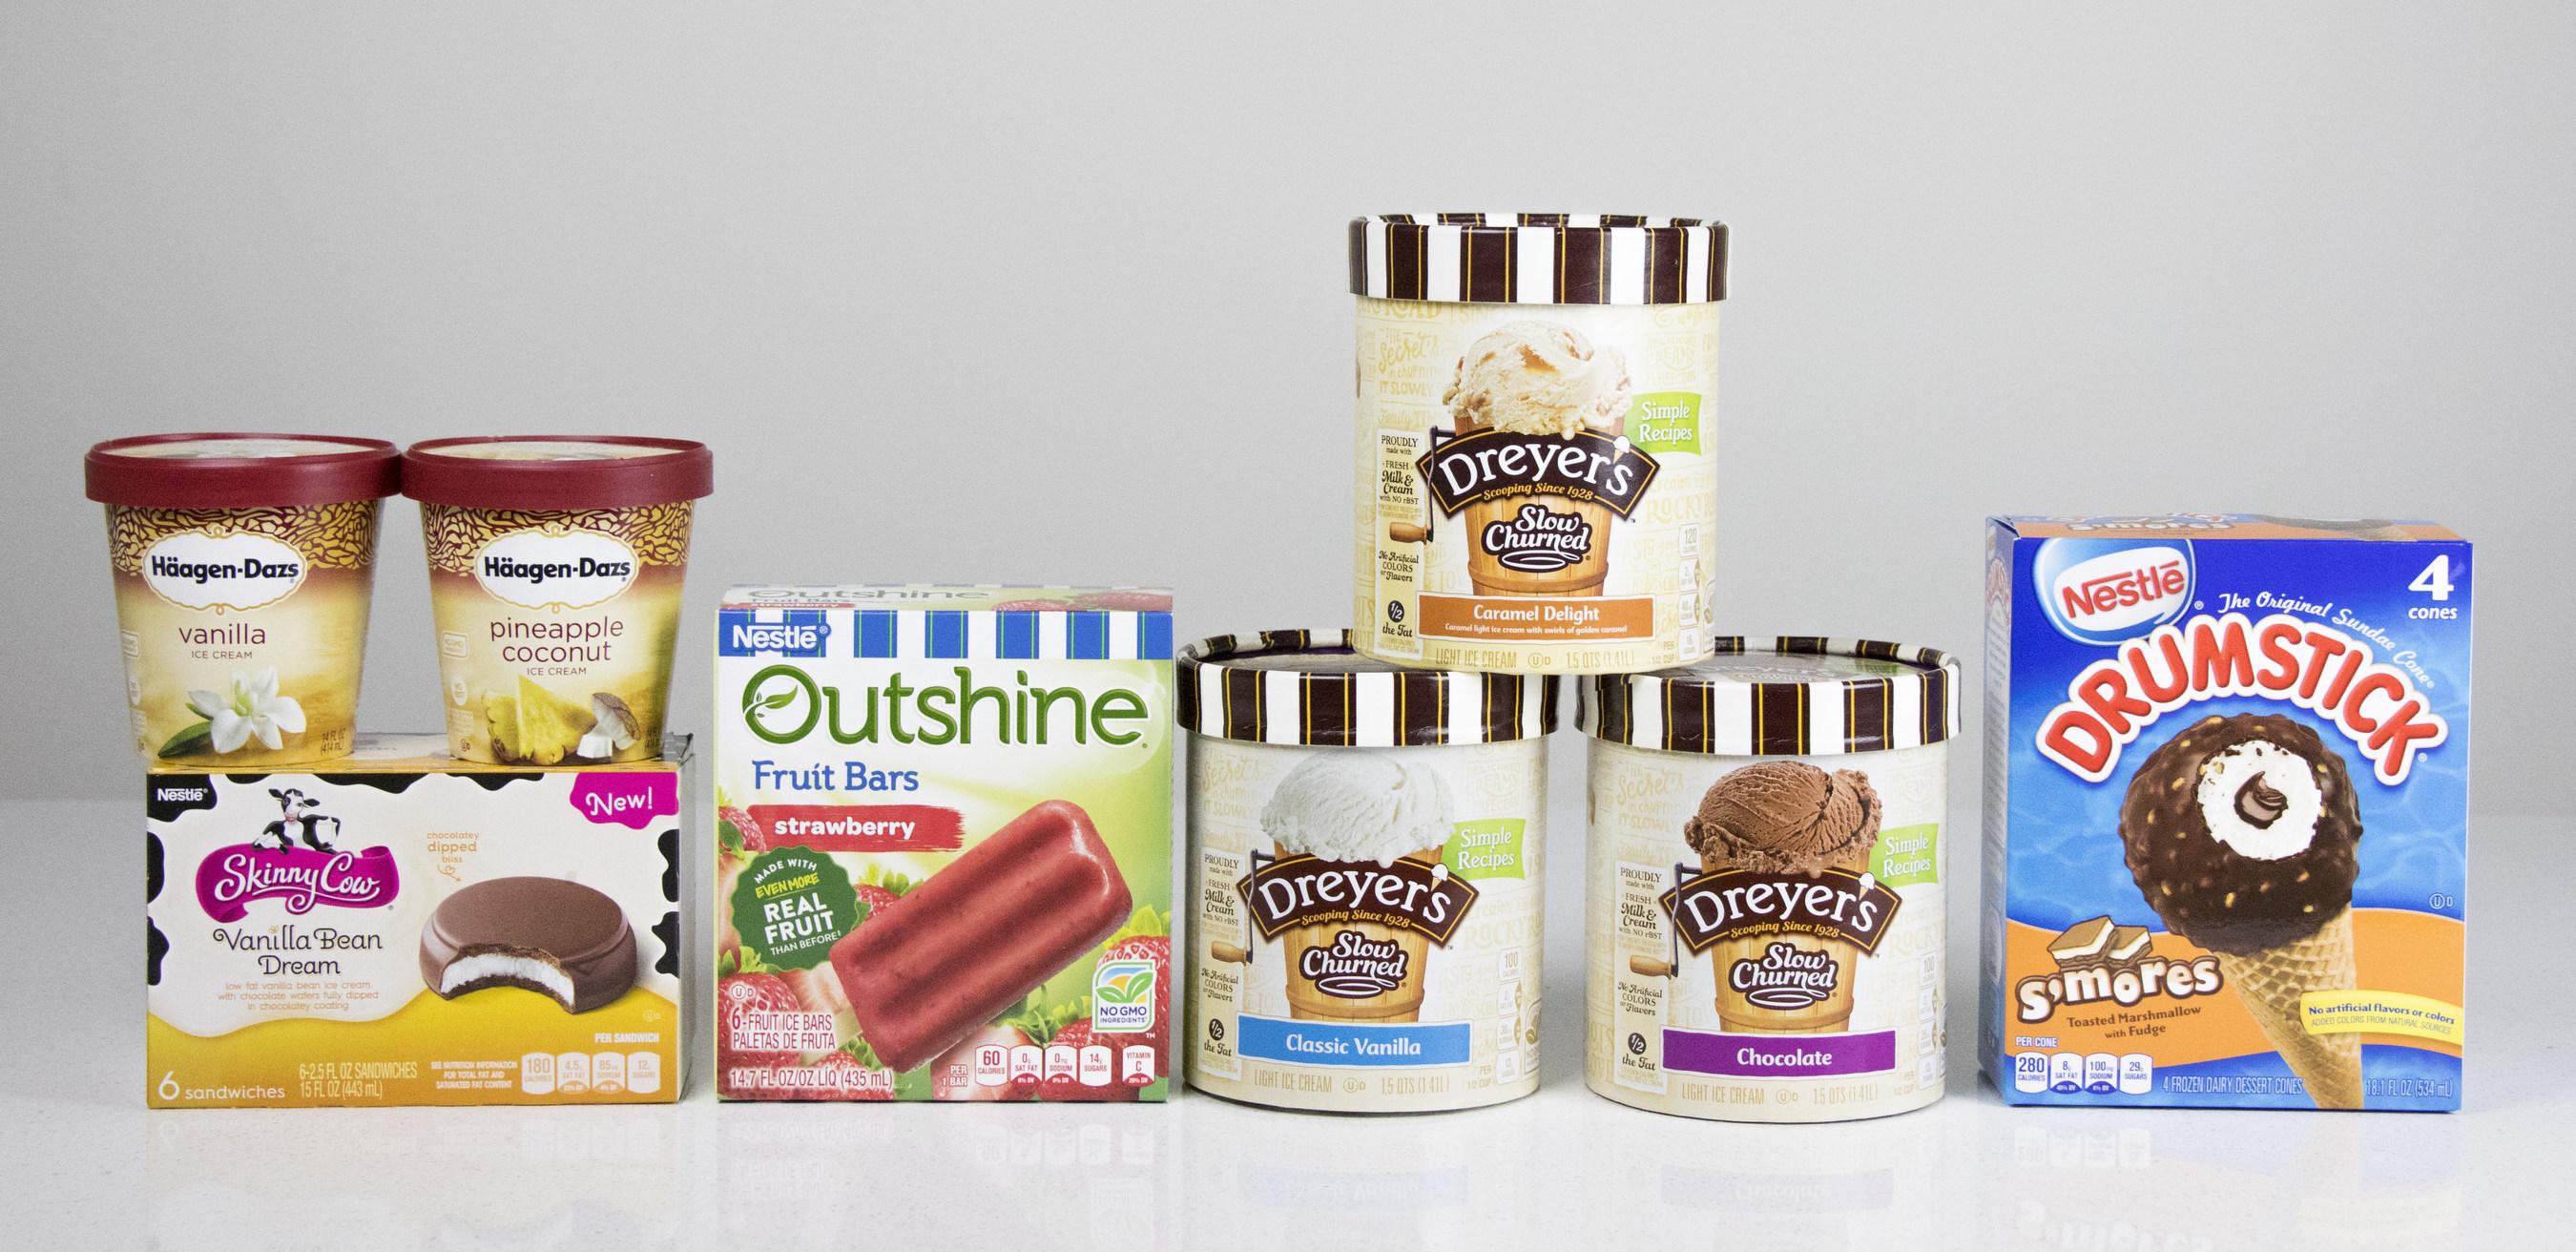 Nestle Ice Cream Products